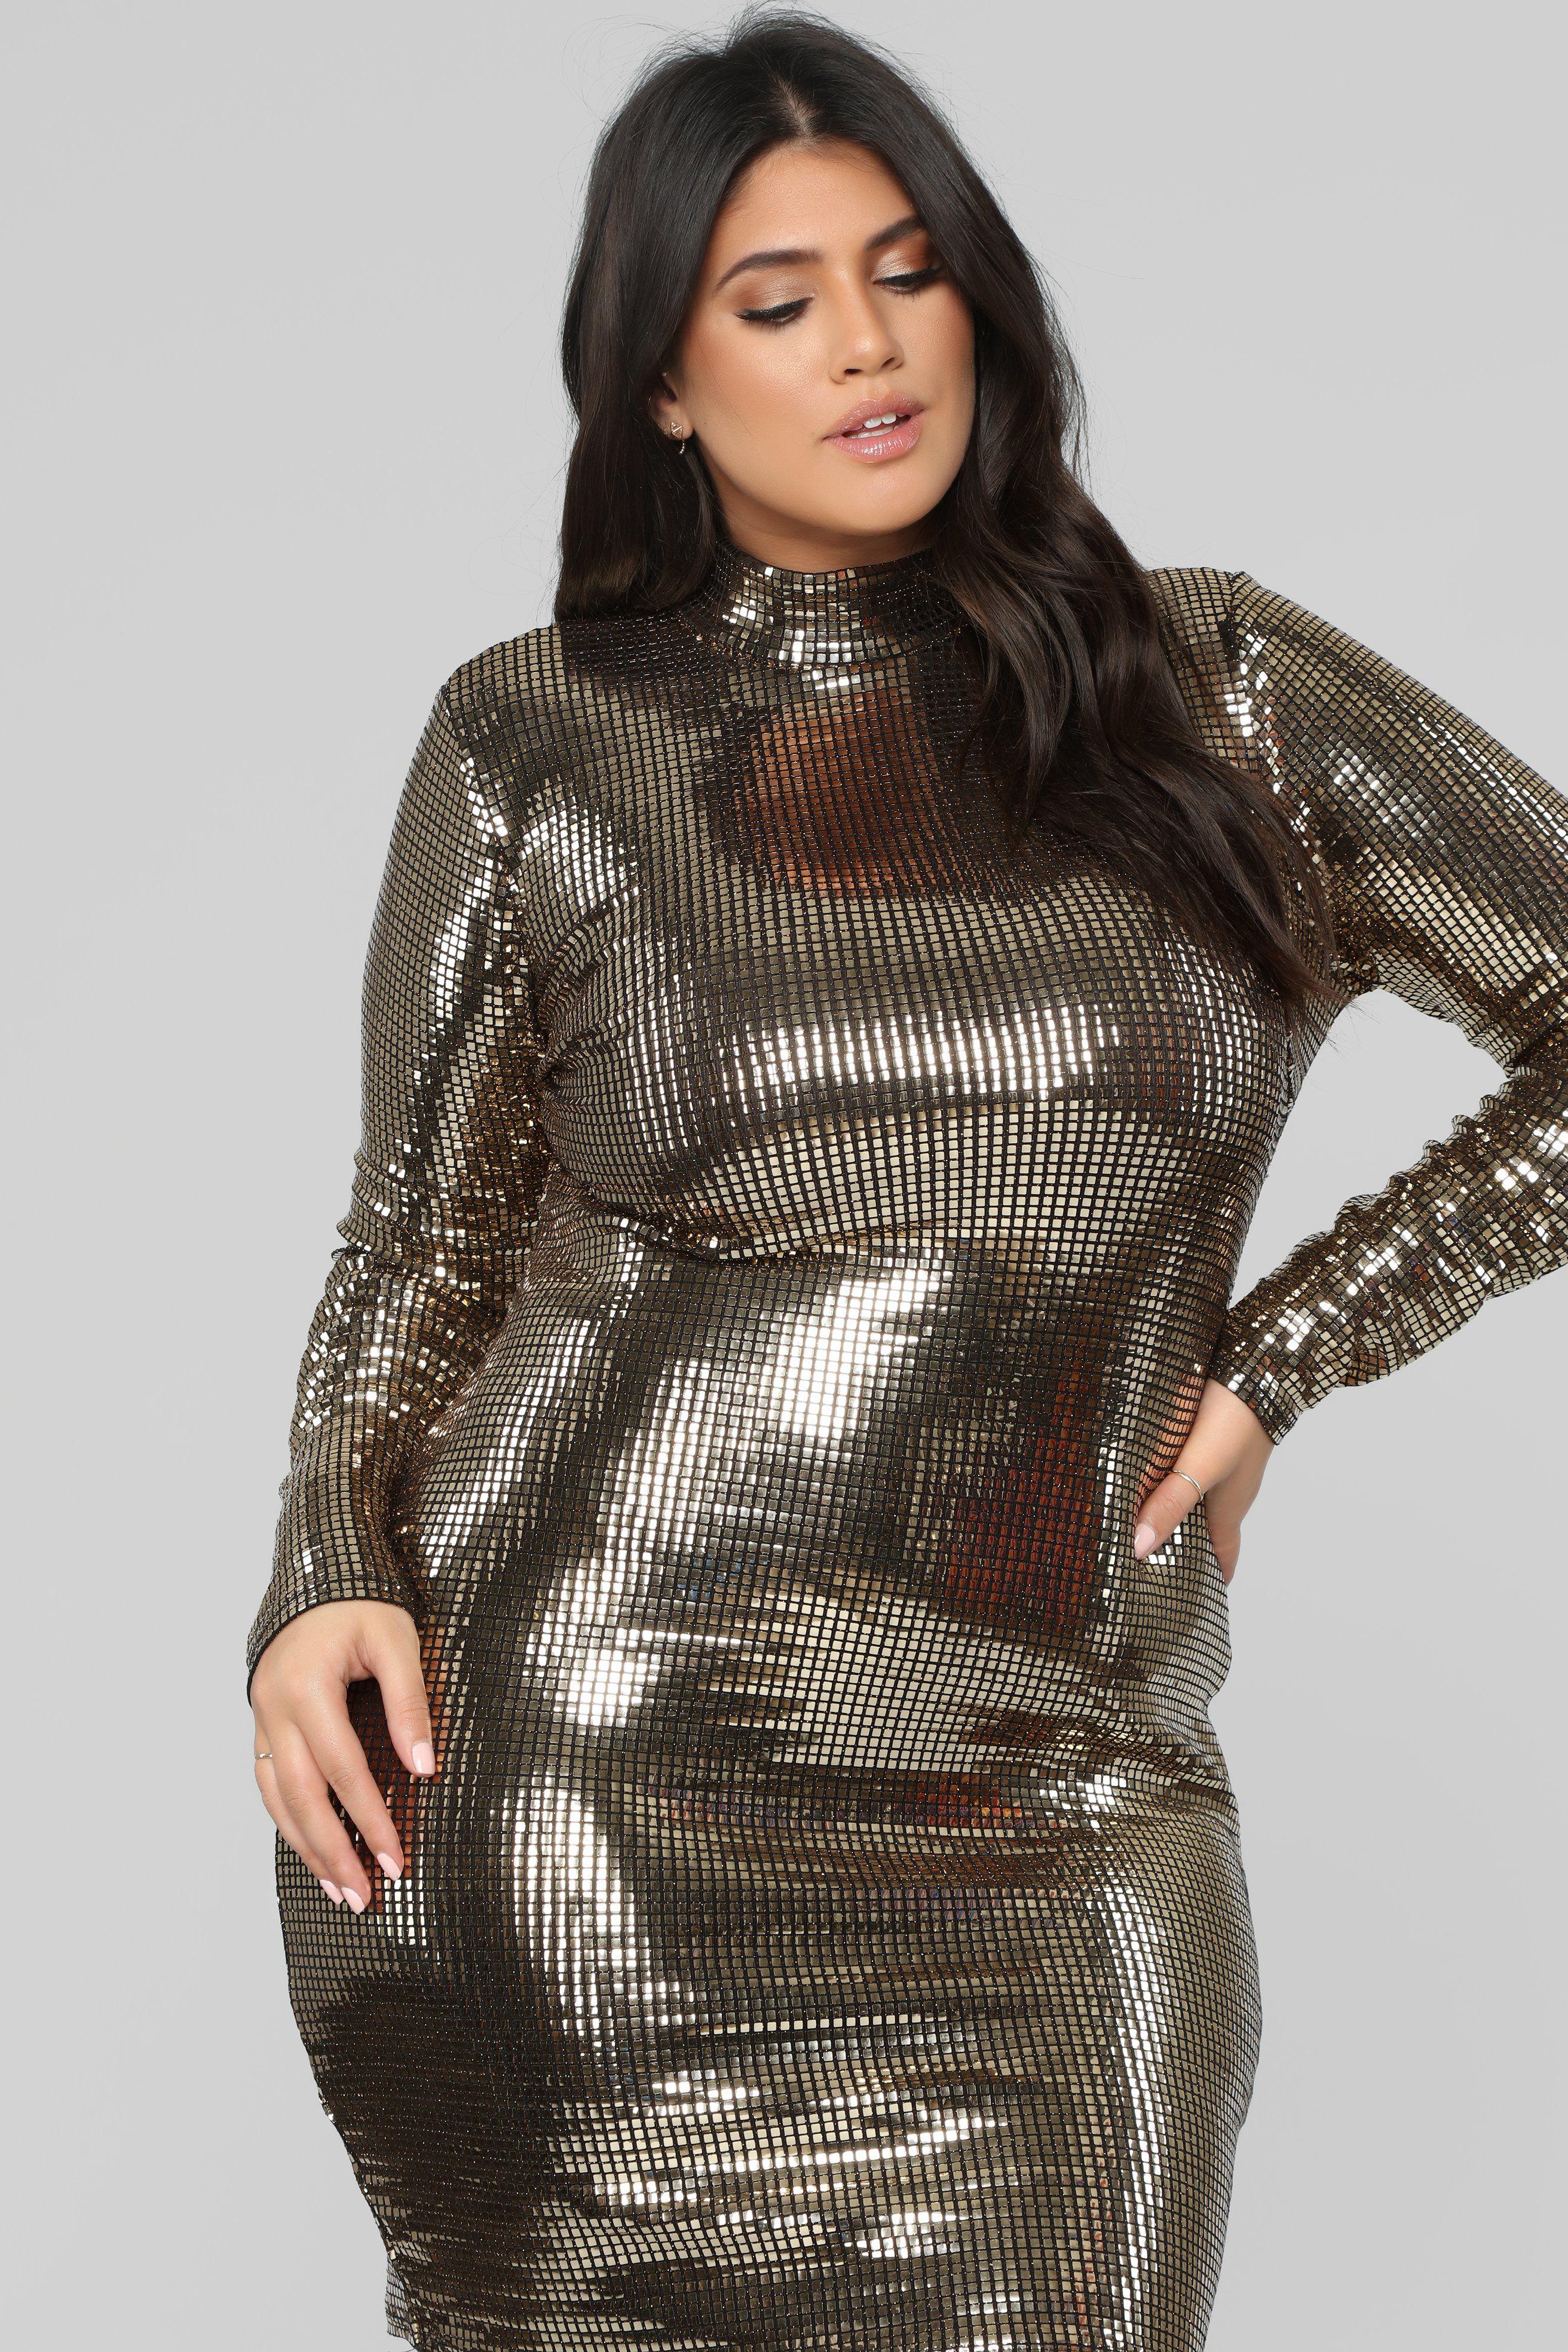 The Glow Up Metallic Dress Gold Gold dress, Metallic